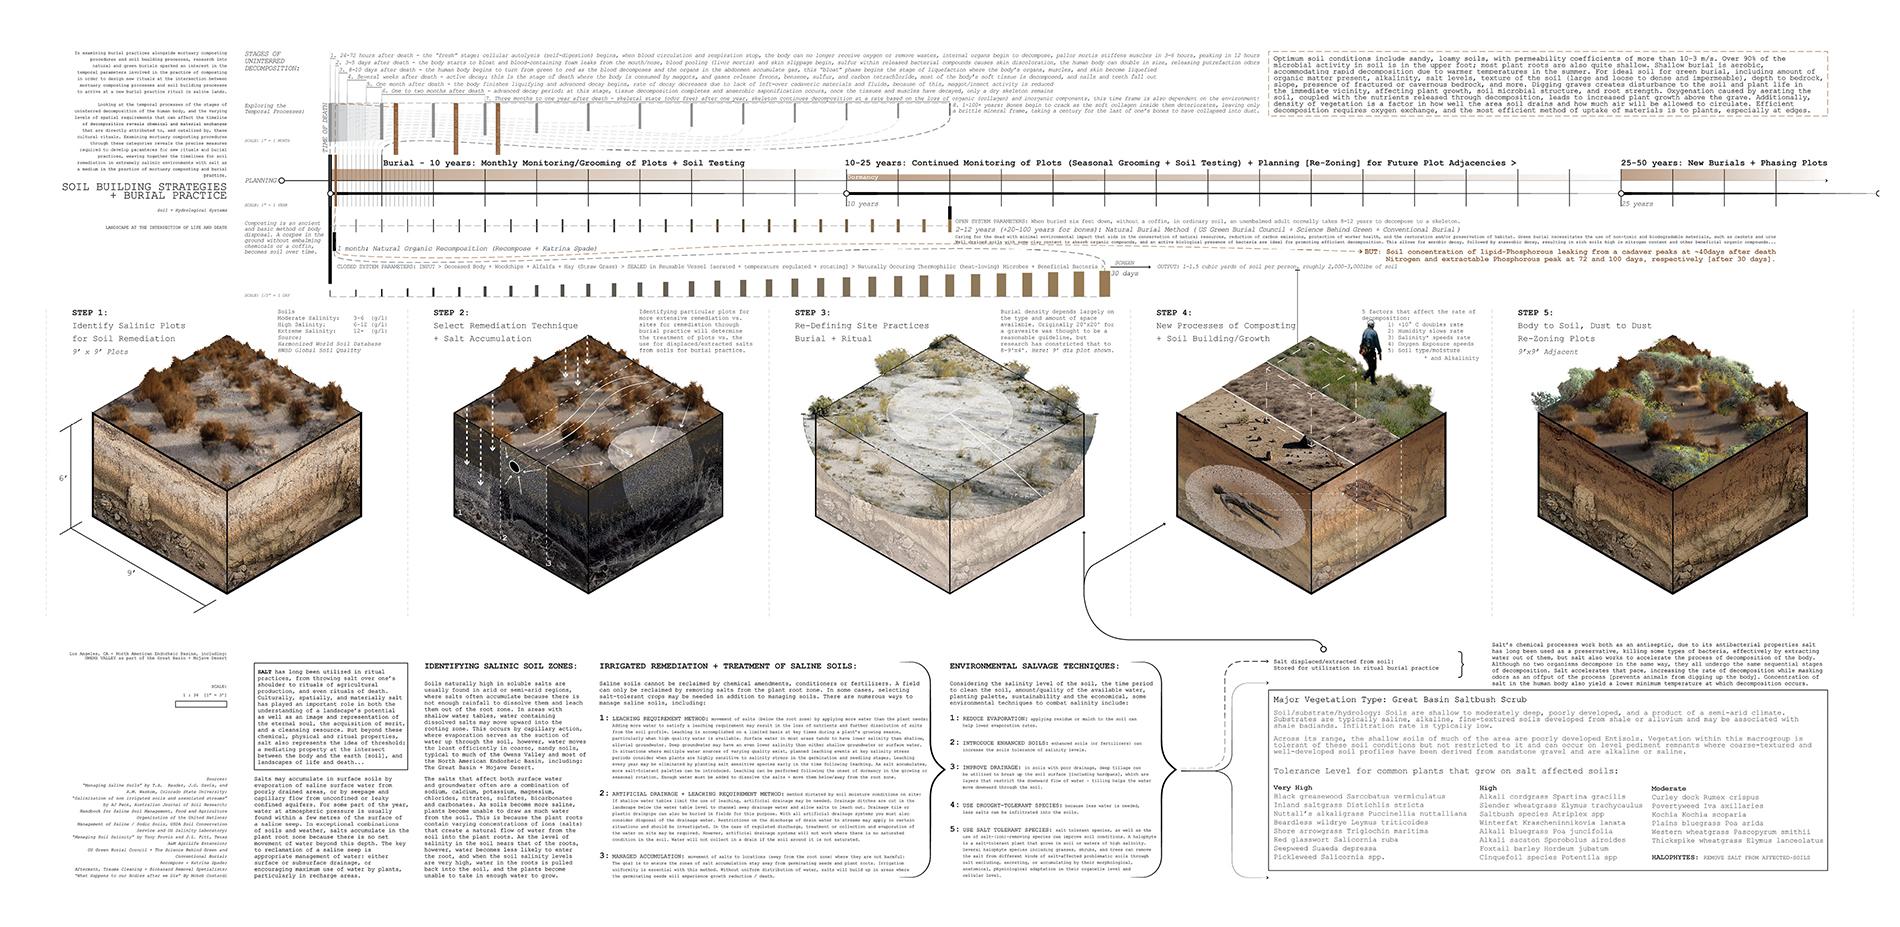 Soil Building Strategies + Green Burial Practices